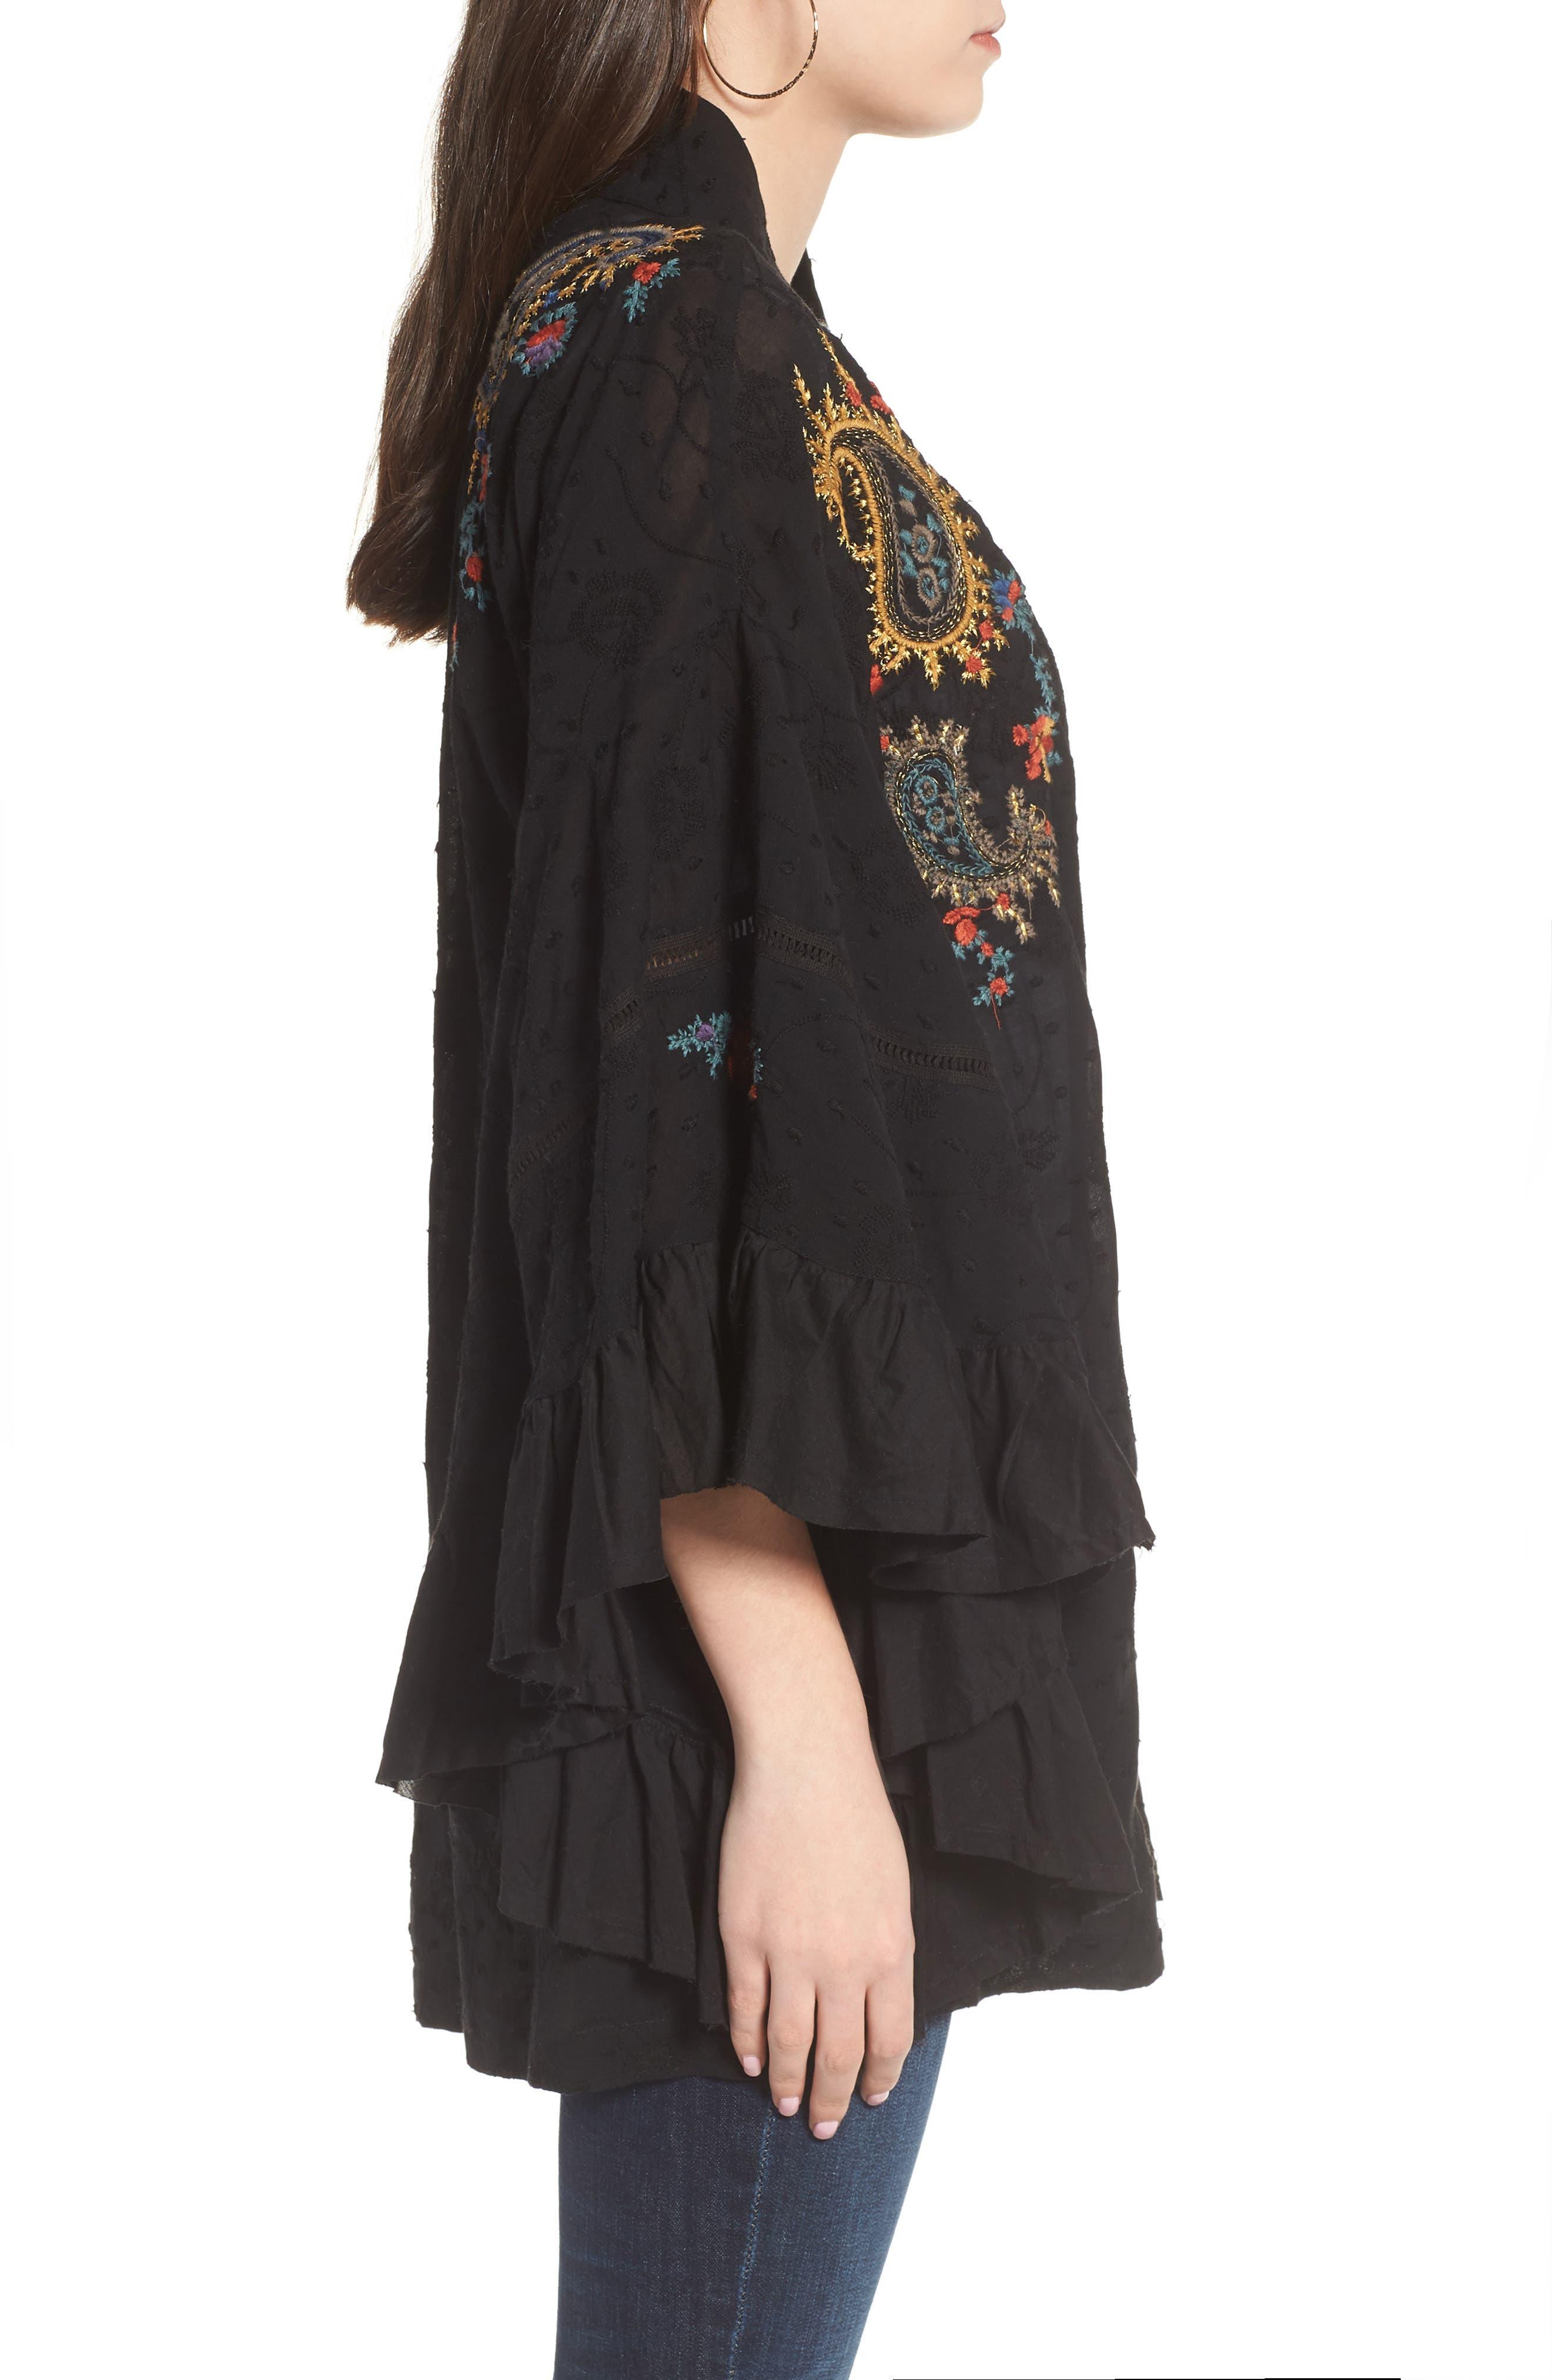 Dottie West Kimono,                             Alternate thumbnail 3, color,                             BLACK